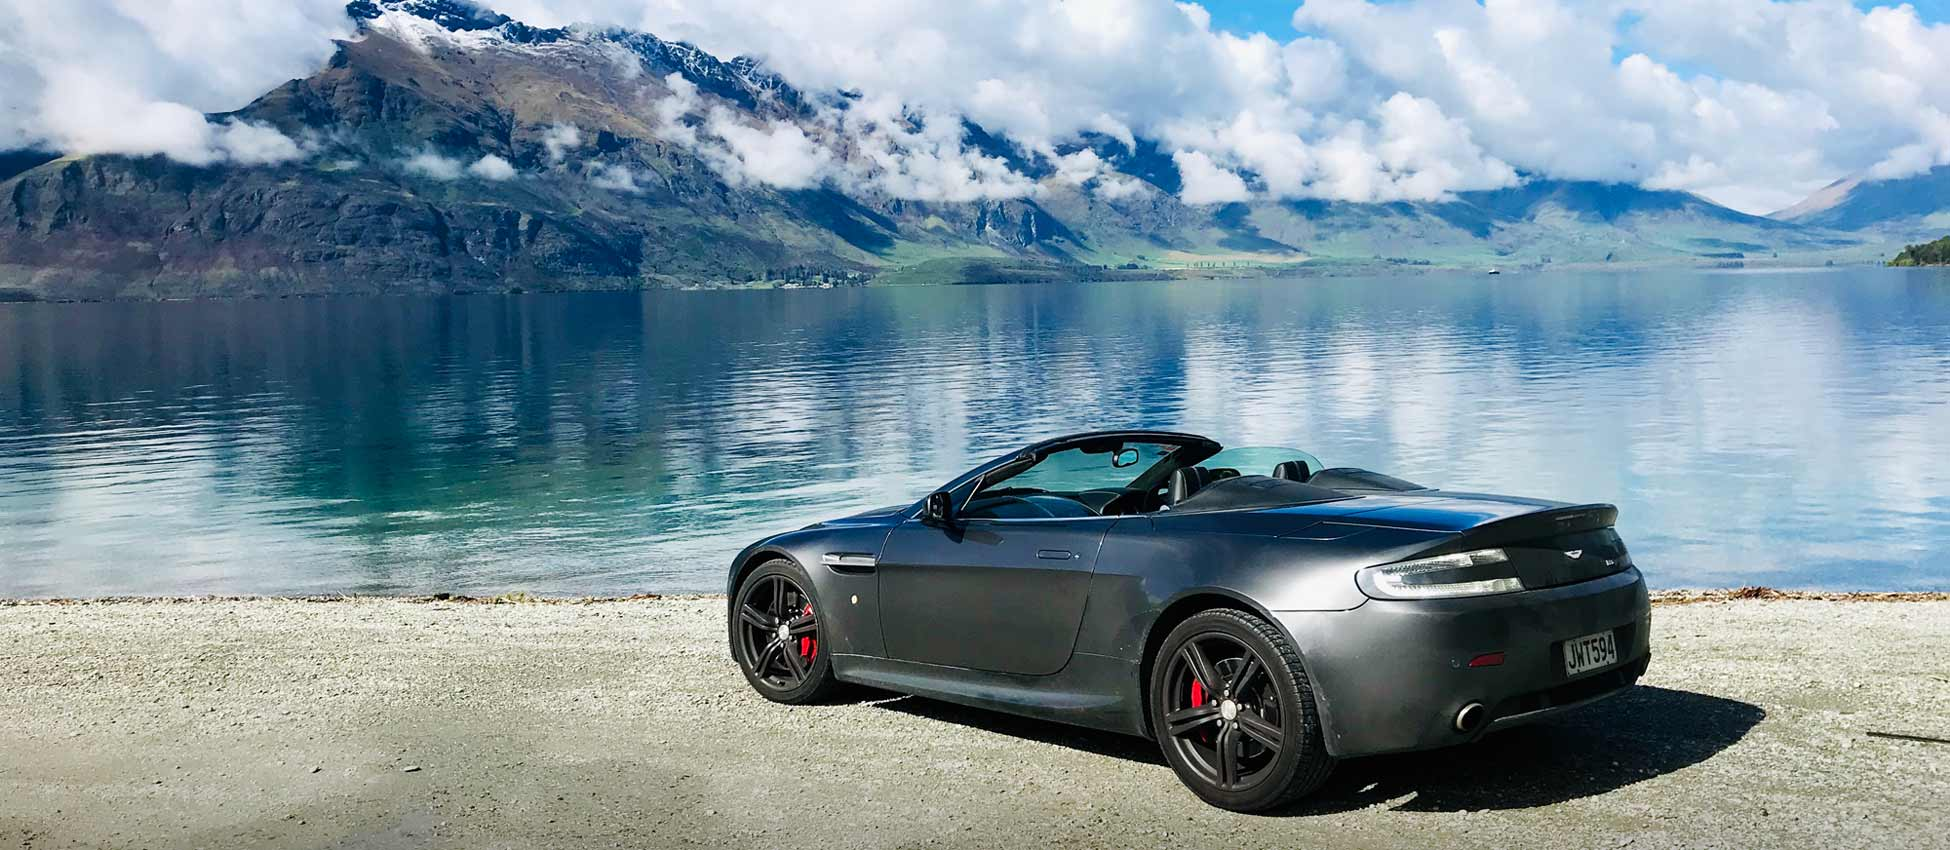 Luxury Car Rental New Zealand Queenstown Auckland Christchurch